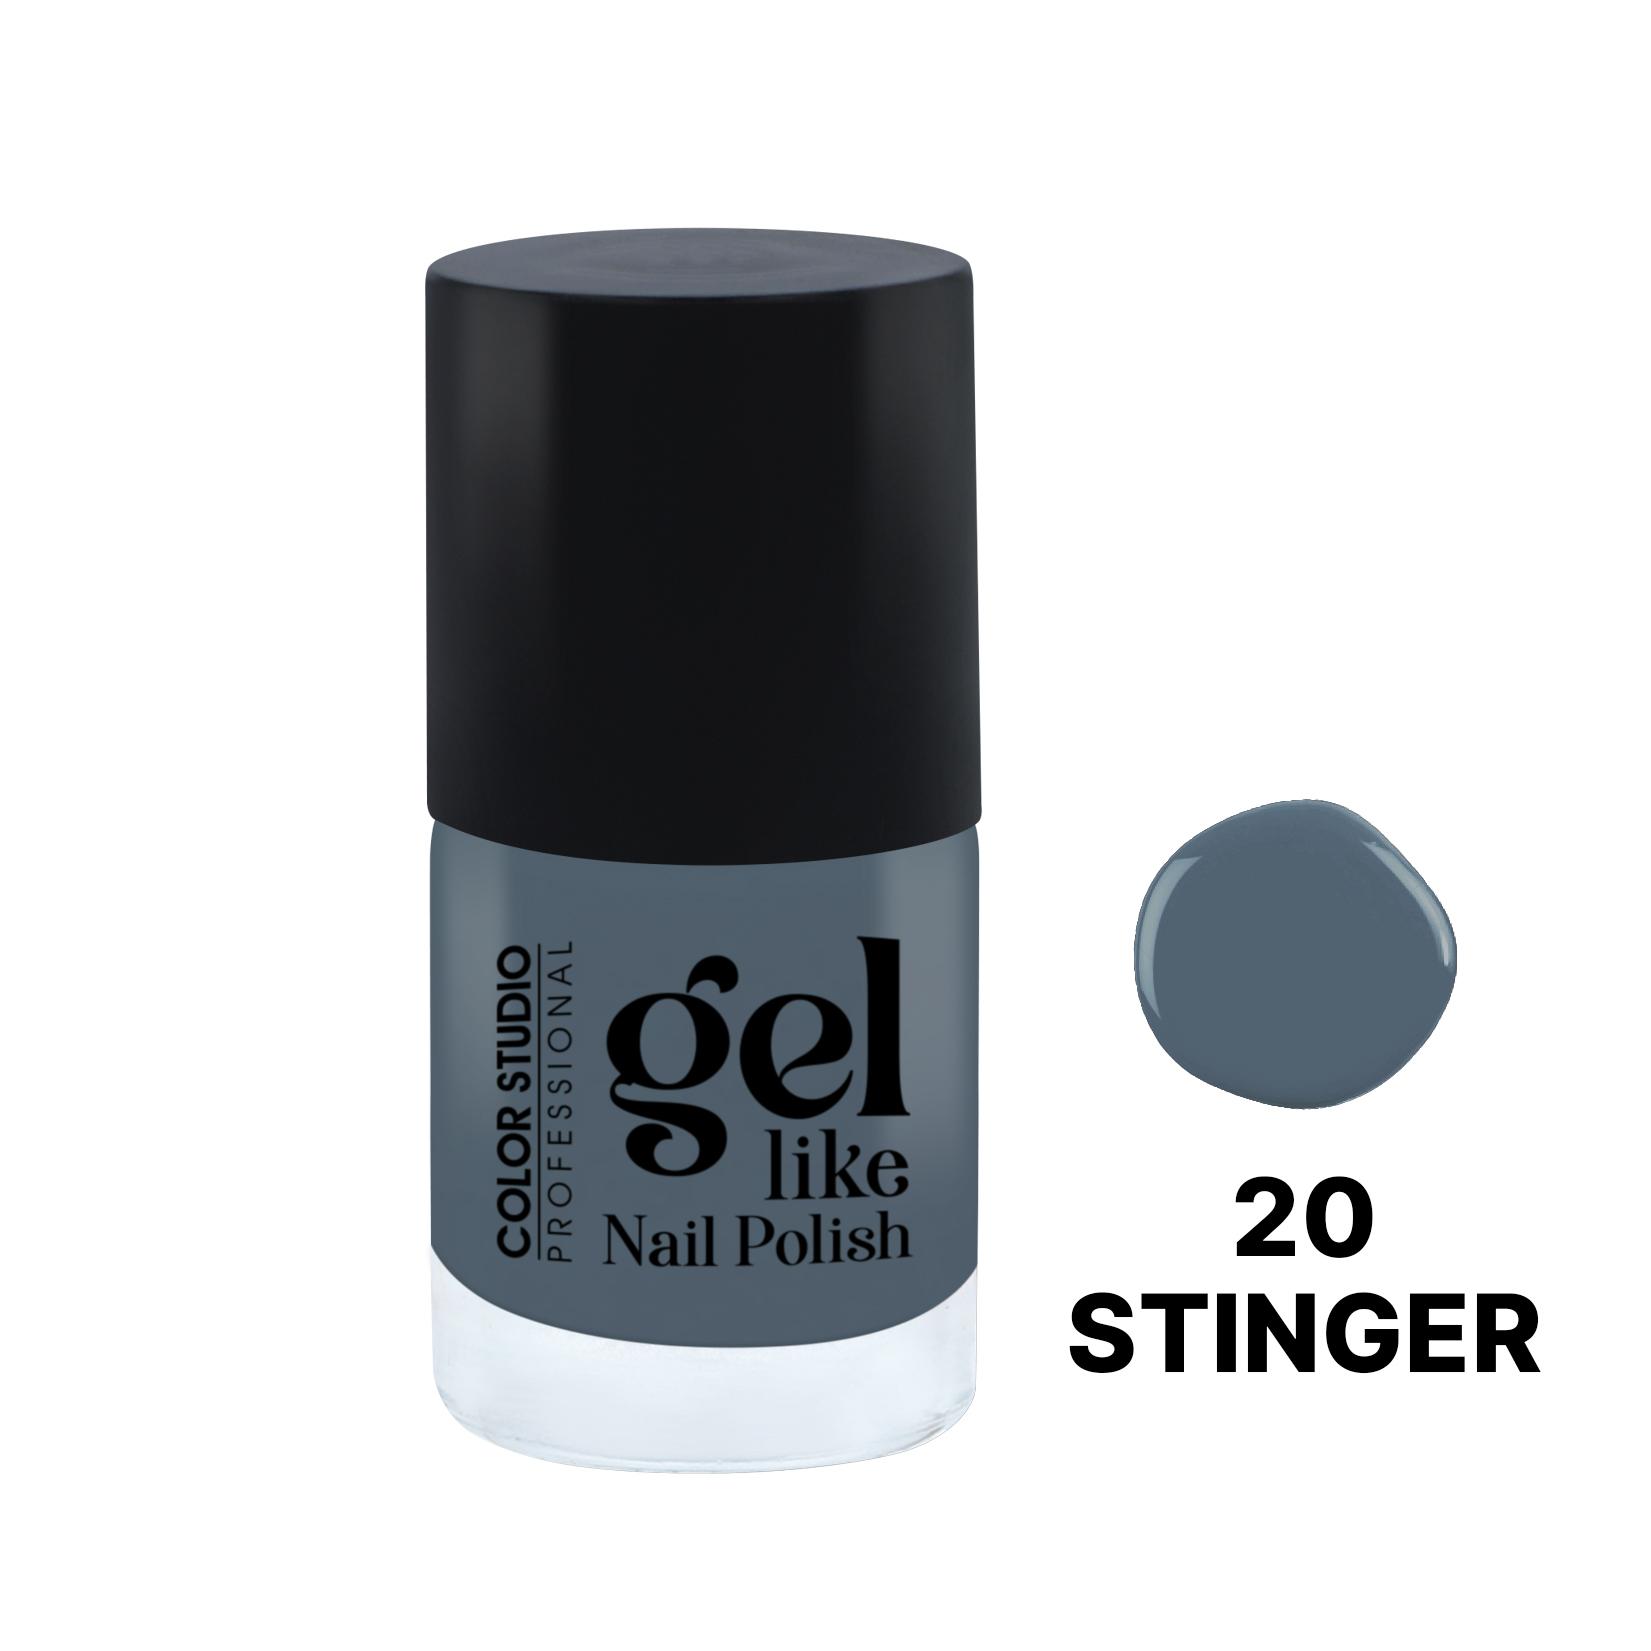 Color Studio Gel Like Nail Polish - 20 Stinger